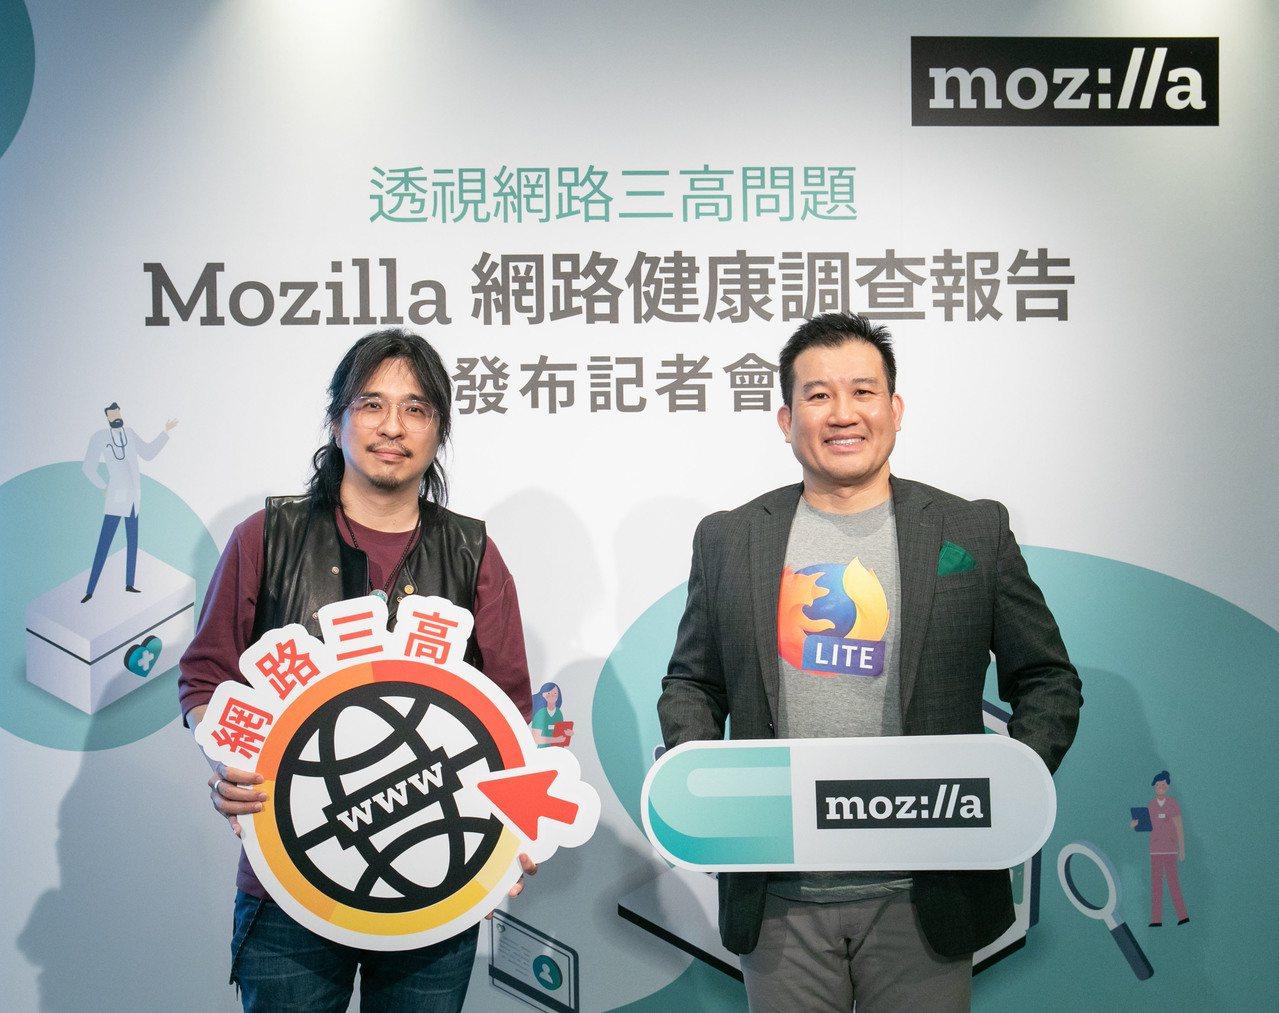 Mozilla新興市場副總裁暨台灣分公司總經理梁永光(右)邀請長期關注數位教育議...